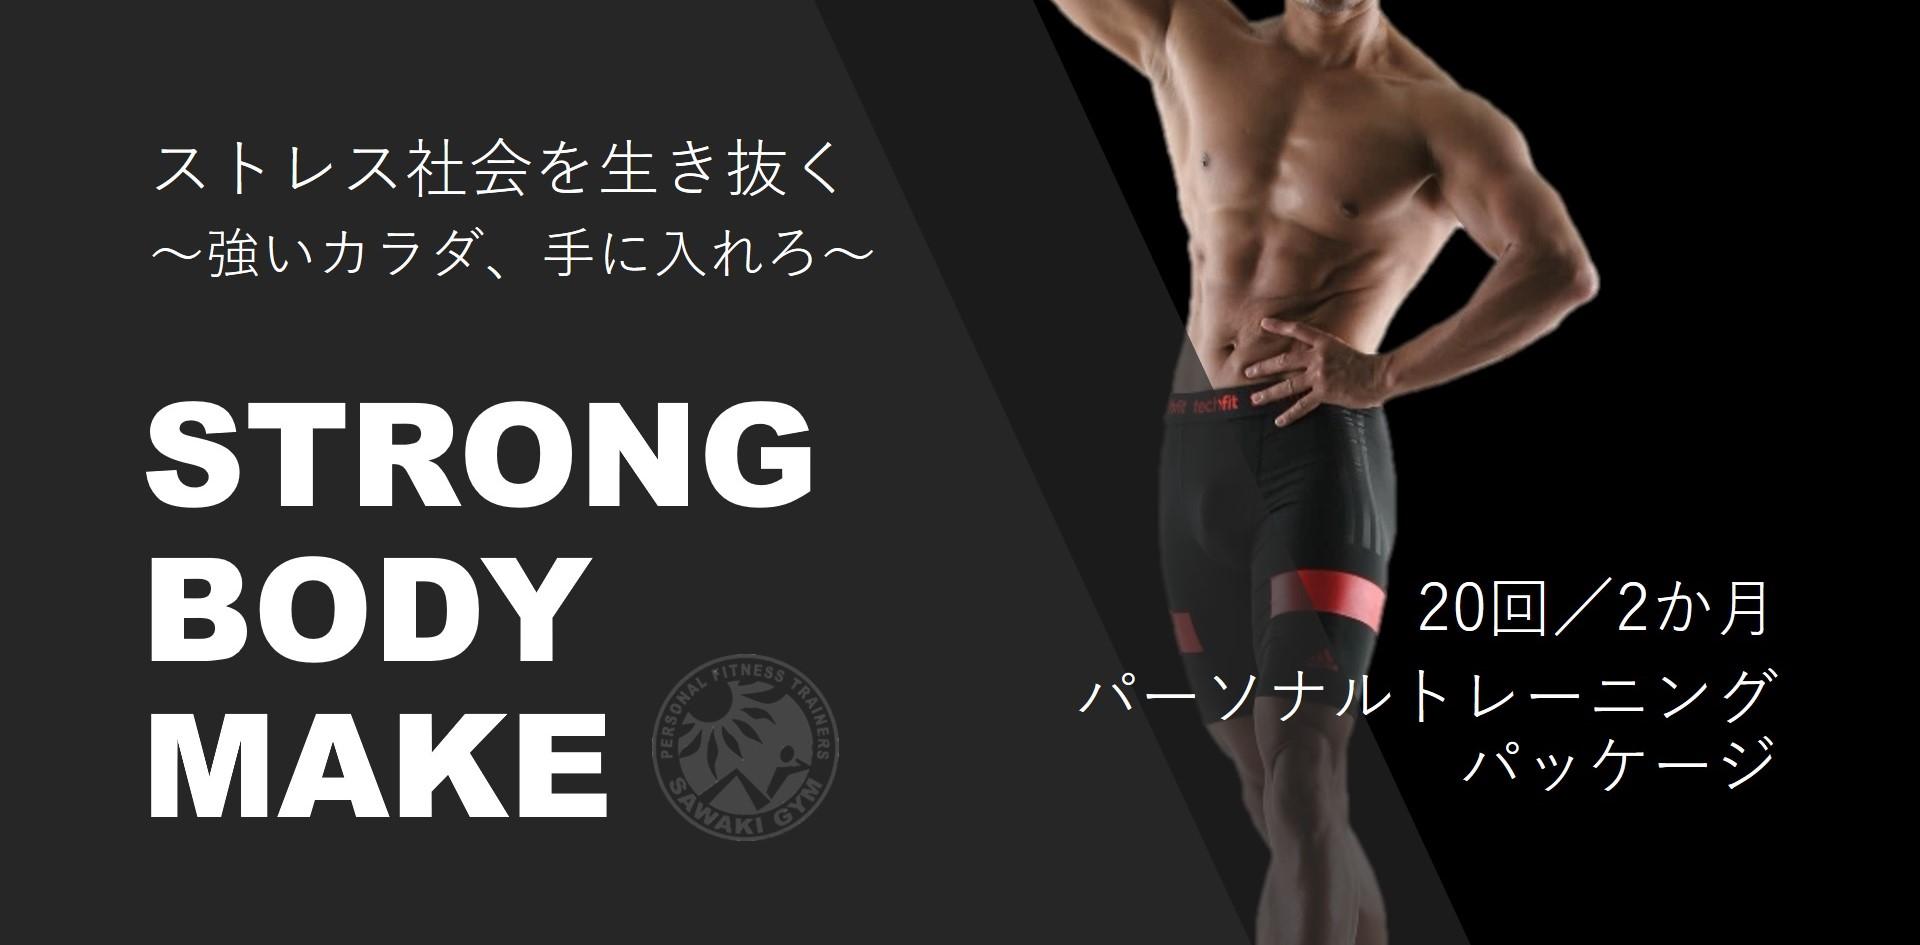 strongbodymake